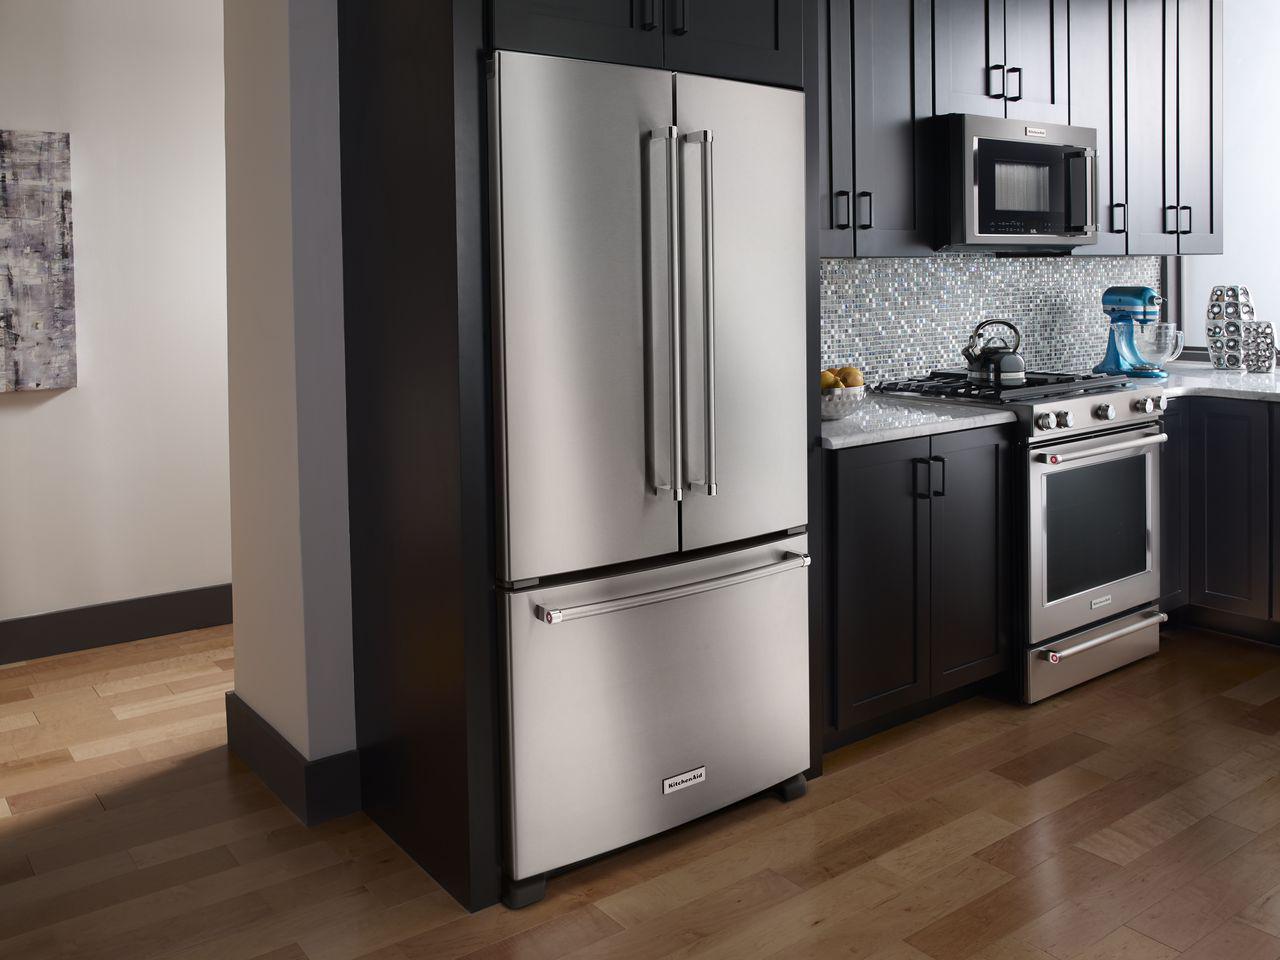 Kitchenaid Overlay French Door Refrigerator Krfc302epa